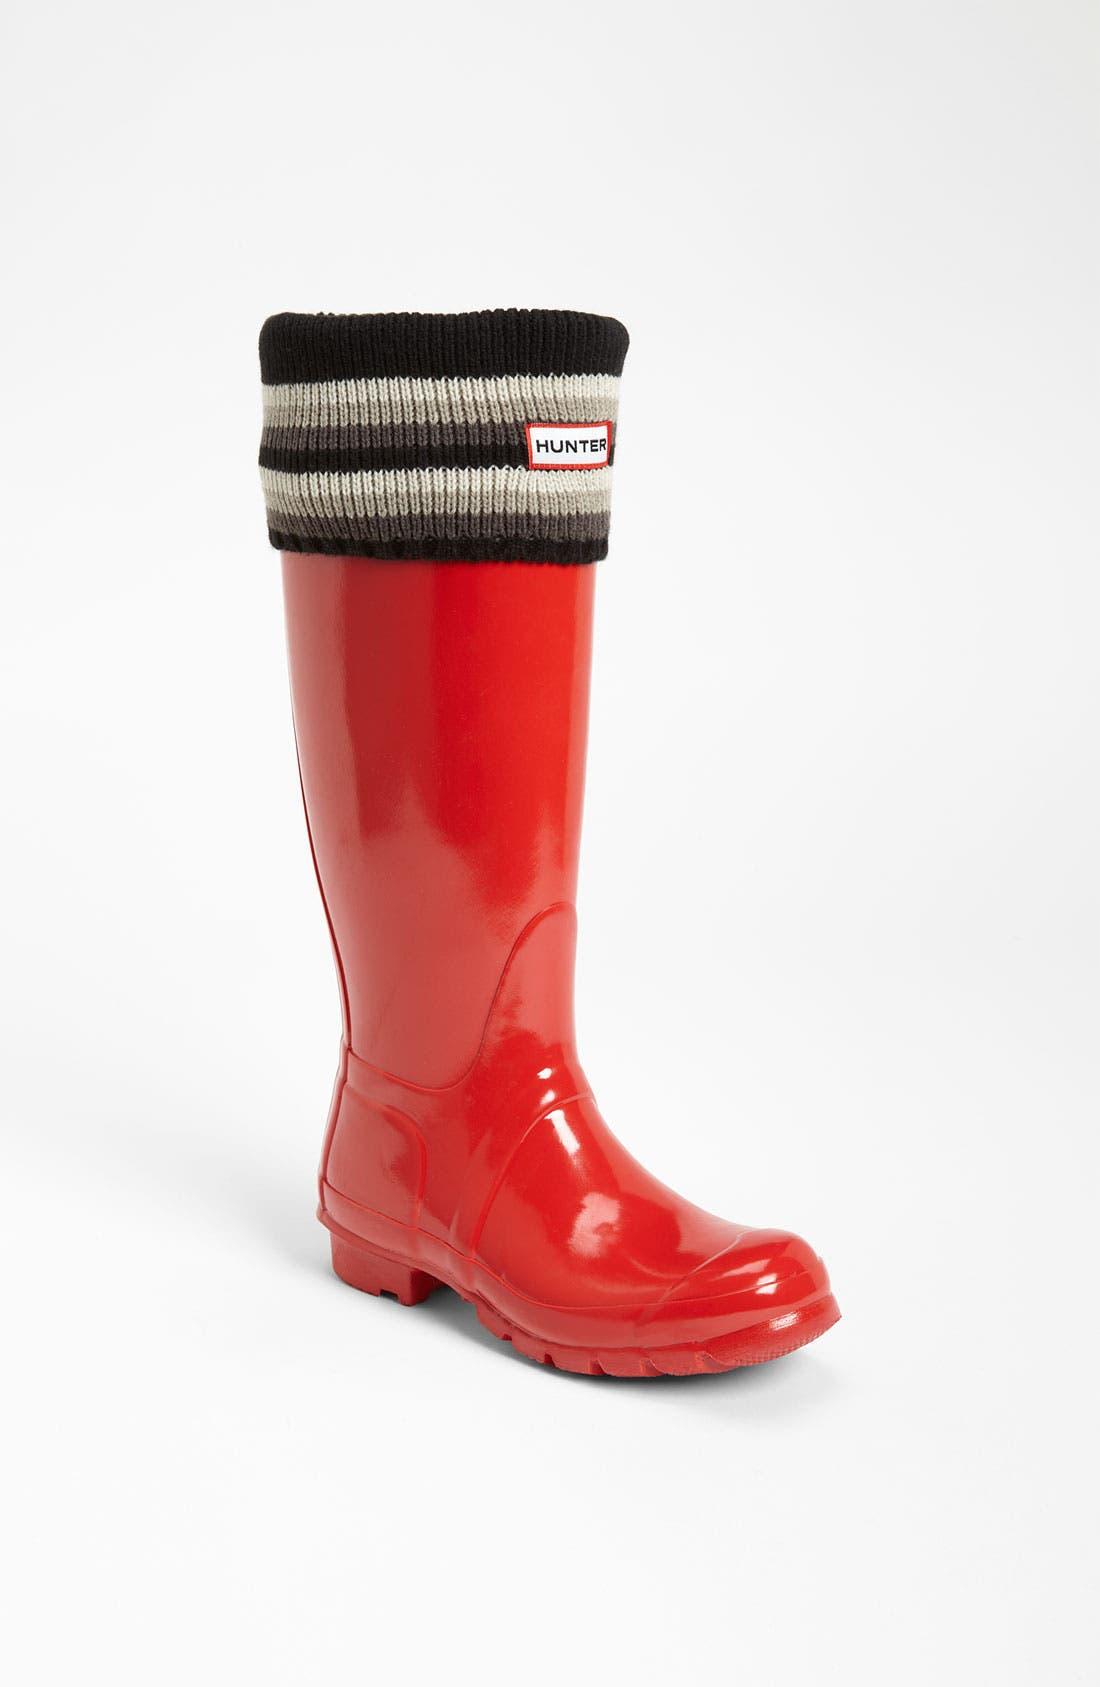 Alternate Image 1 Selected - Hunter Tall Gloss Rain Boot & Pattern Cuff Welly Socks